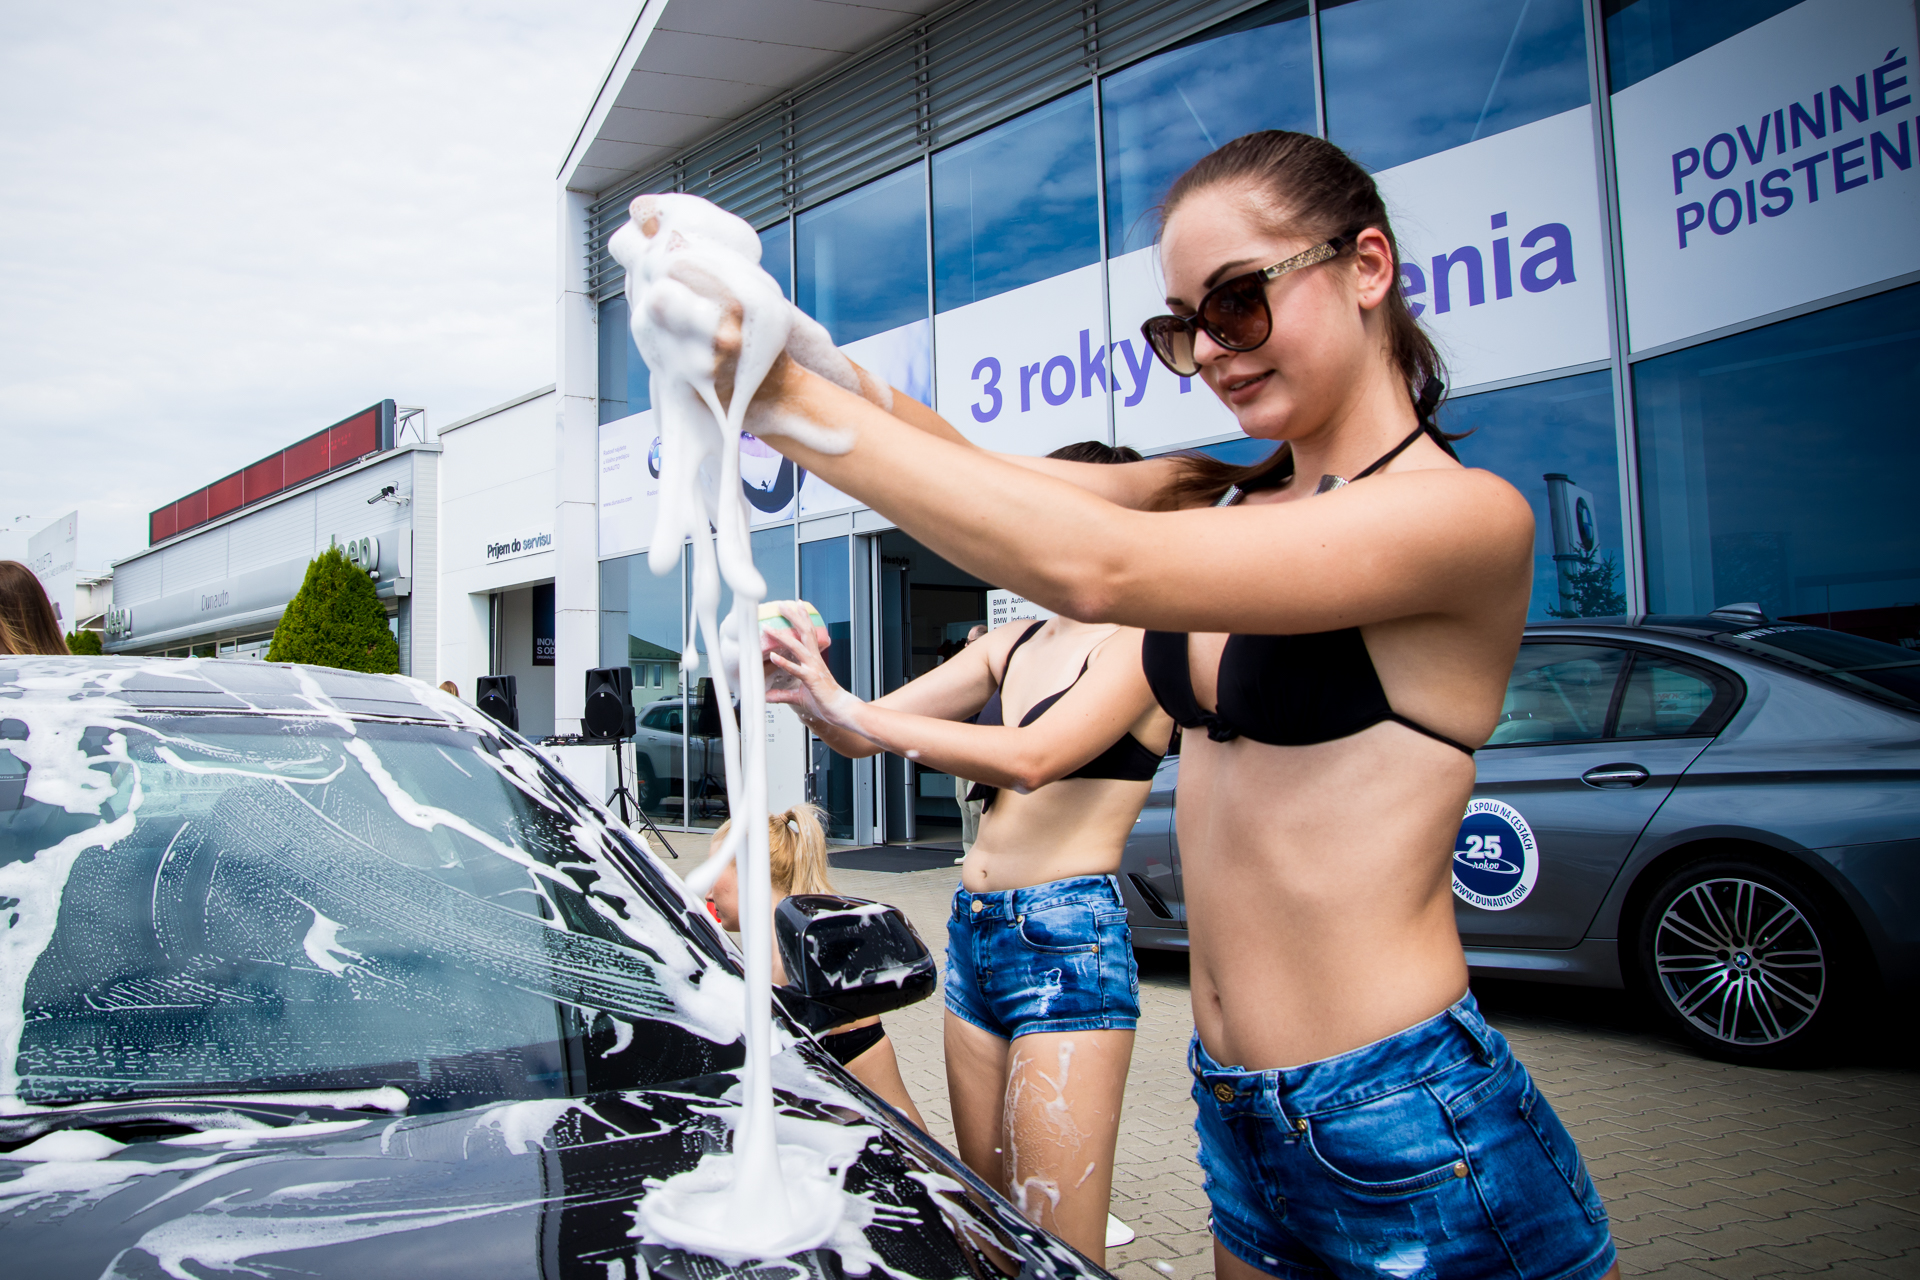 Bikini Car Wash On Twitter